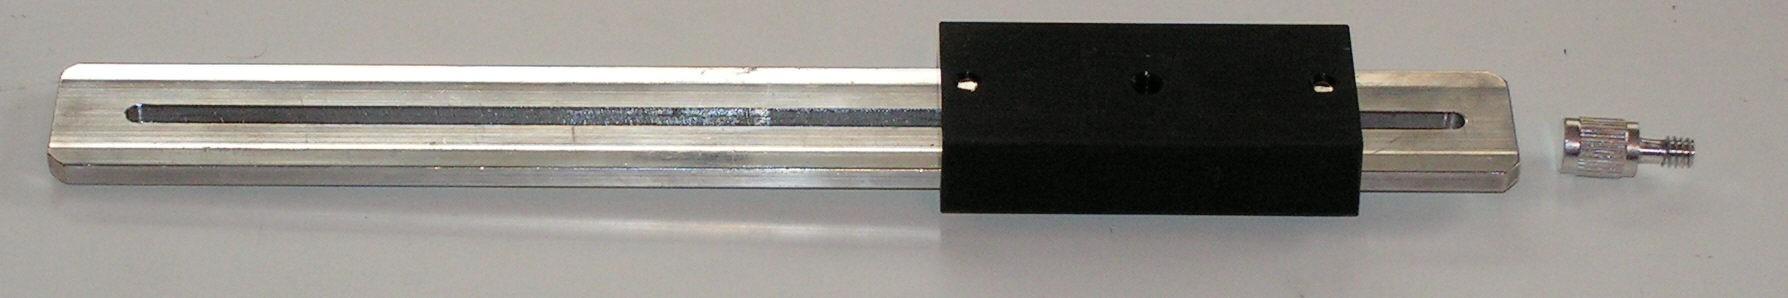 Balancing Dovetail Bar - Extra Long Camera Platform for Porta, Merlin, GIAZ, Autotrack